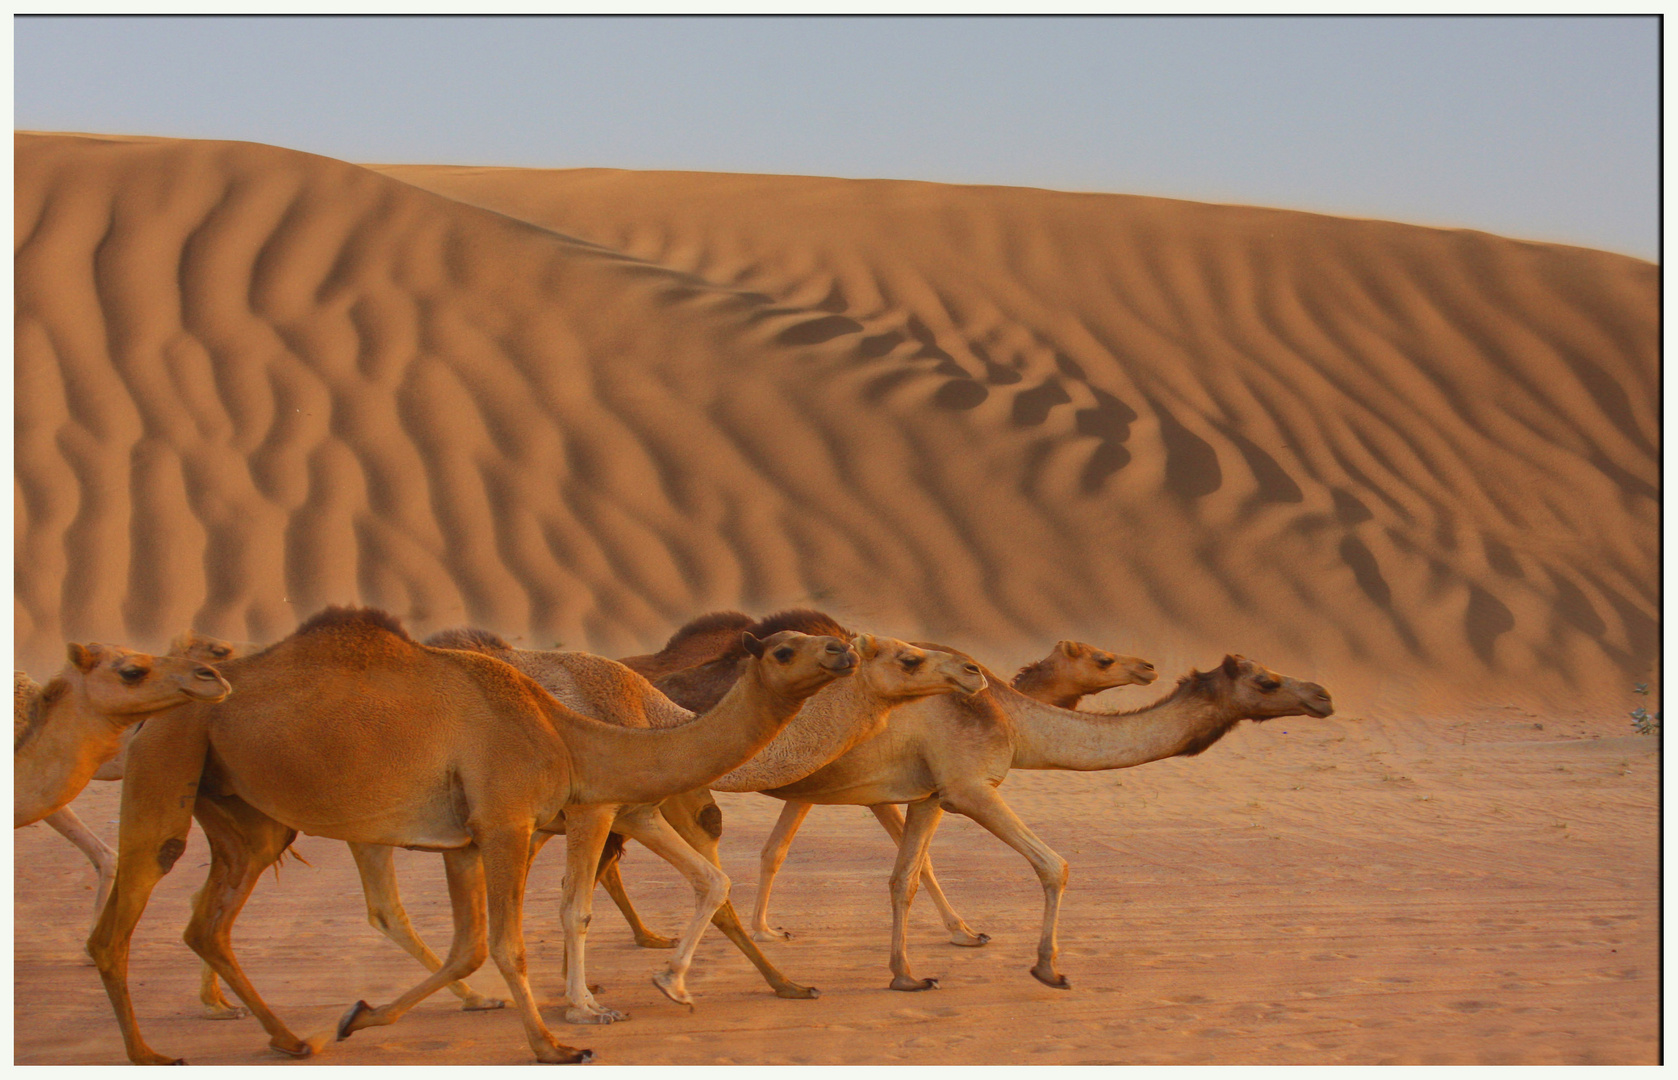 The Desert's Caravan of Dubai